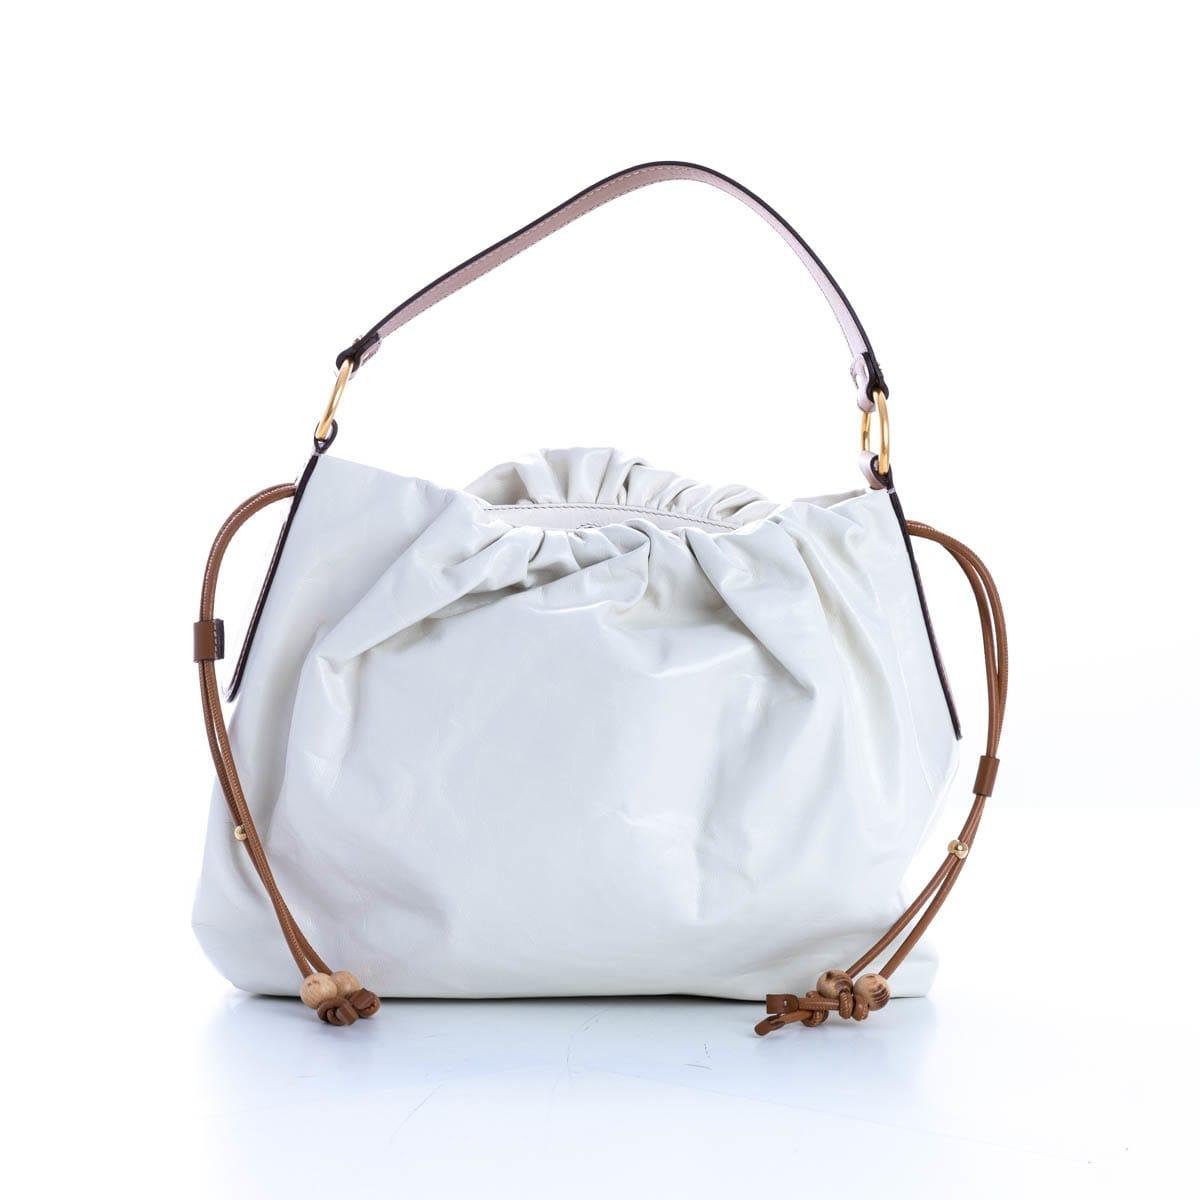 Gianni Chiarini Gianni Chiarini peonia Leather Bag